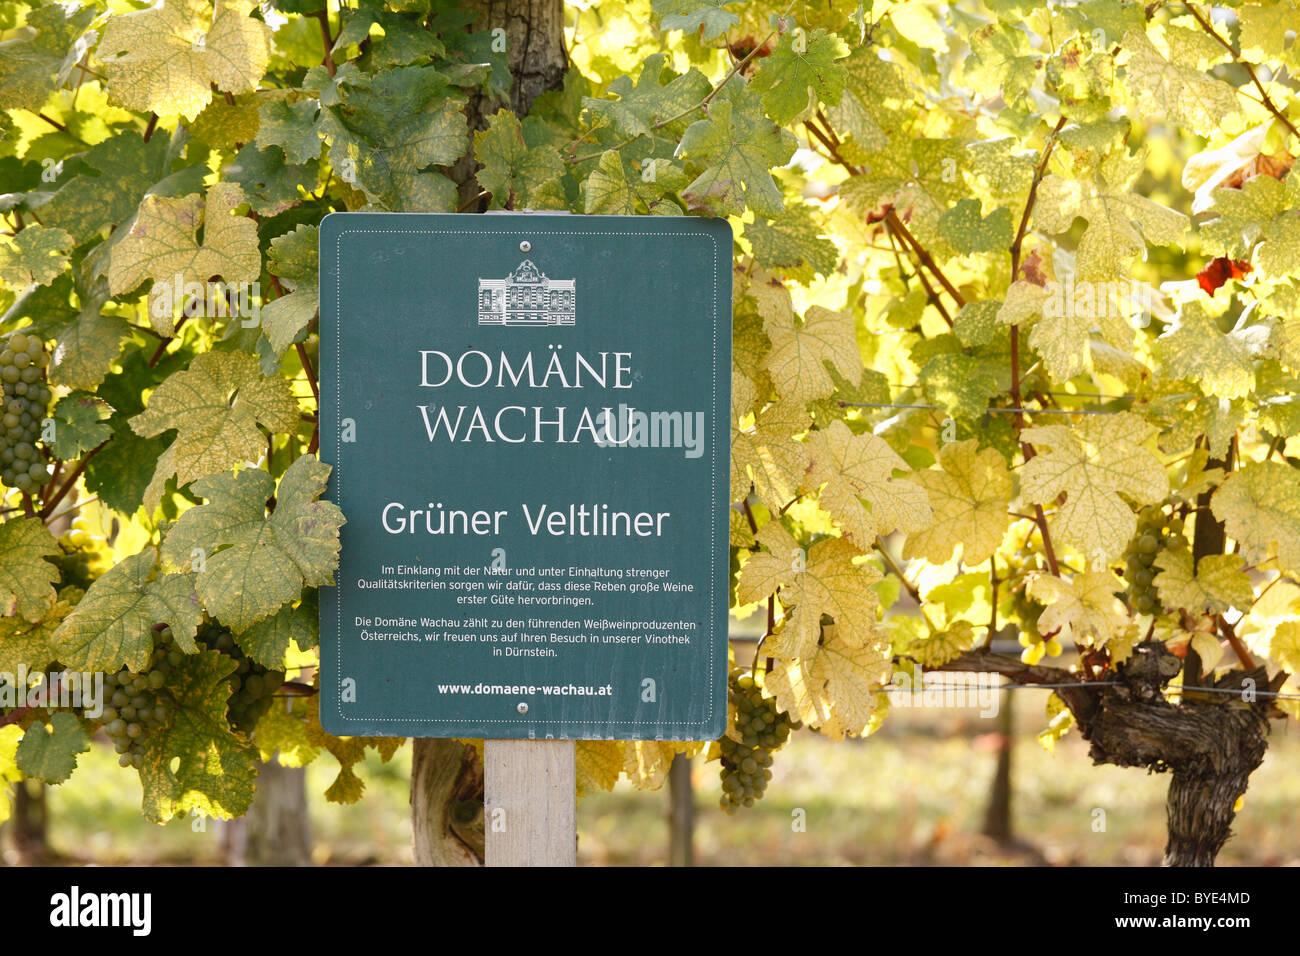 Sign, Domain Wachau Gruener Veltliner grapes in a vineyard, Wachau, Waldviertel, Lower Austria, Austria, Europe - Stock Image